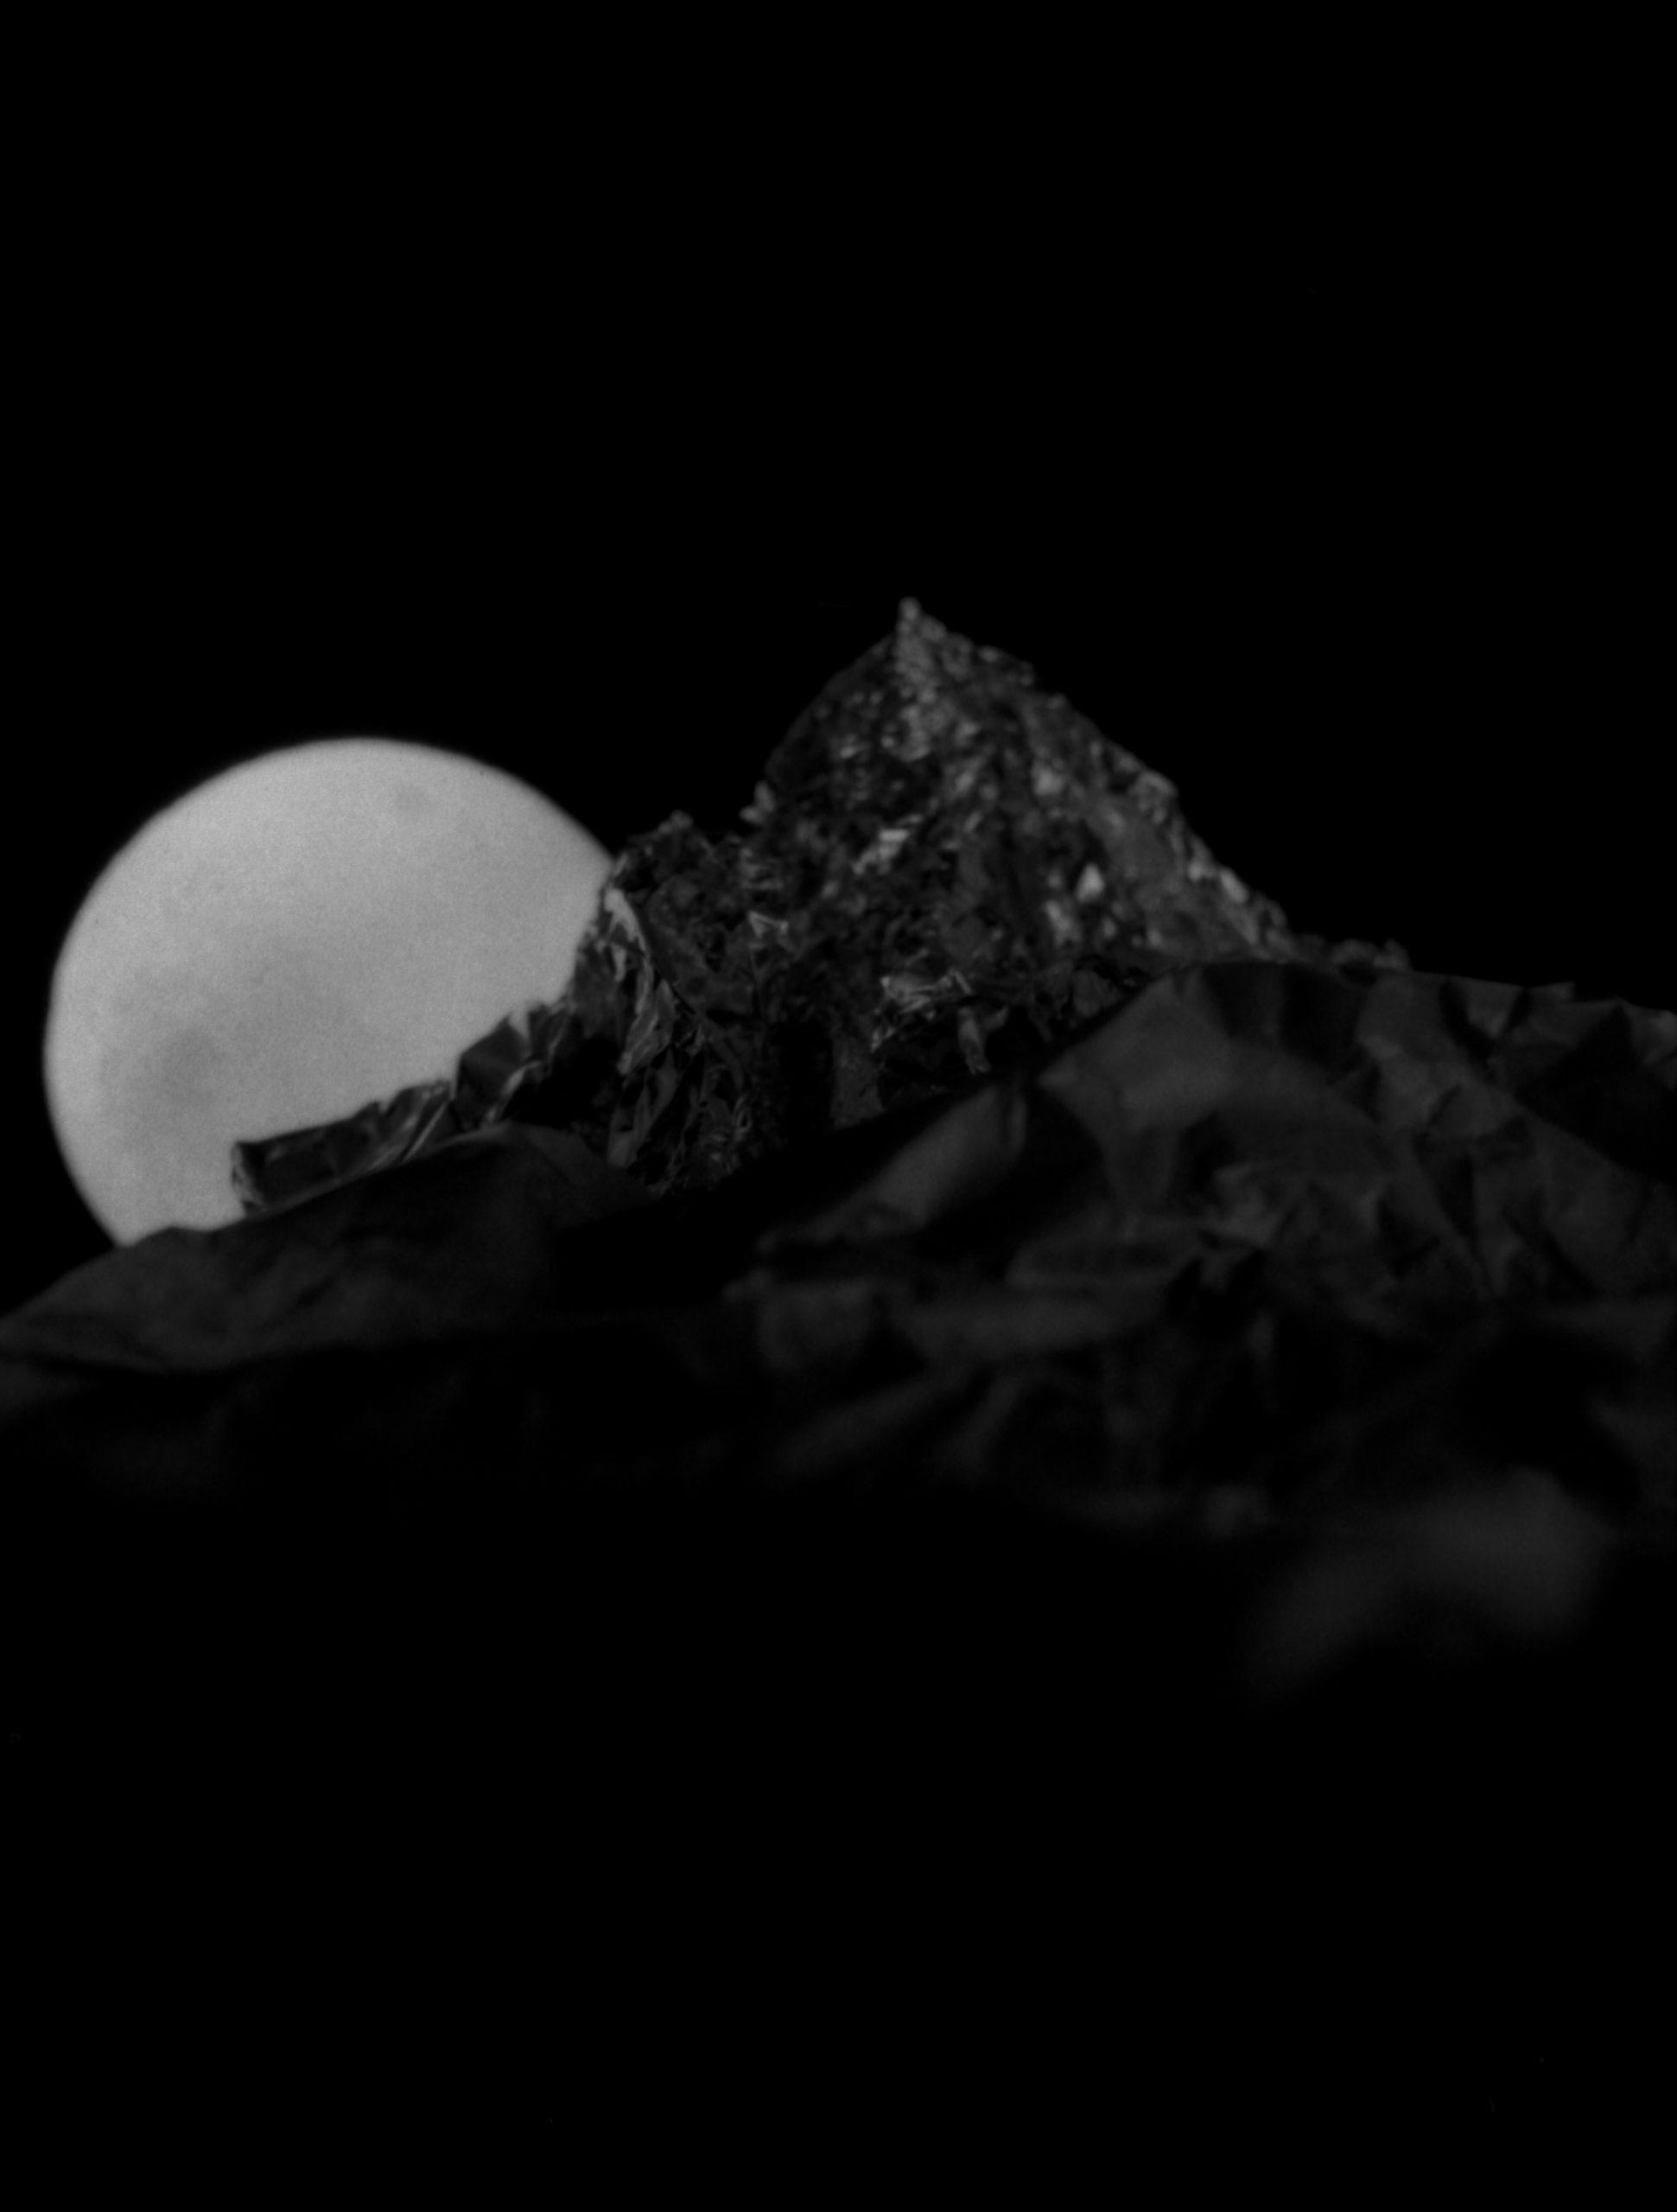 da montanha e da lua - Film 001